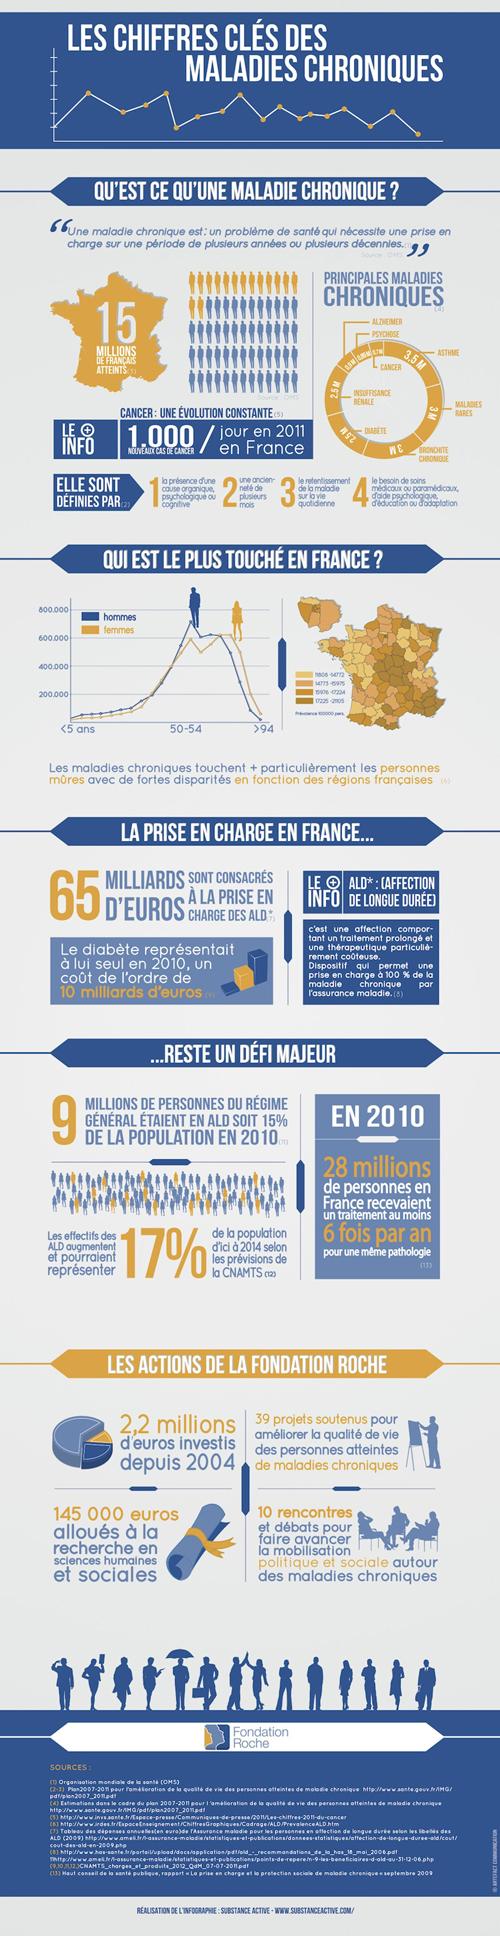 infographieChiffresClesmaladieschroniques